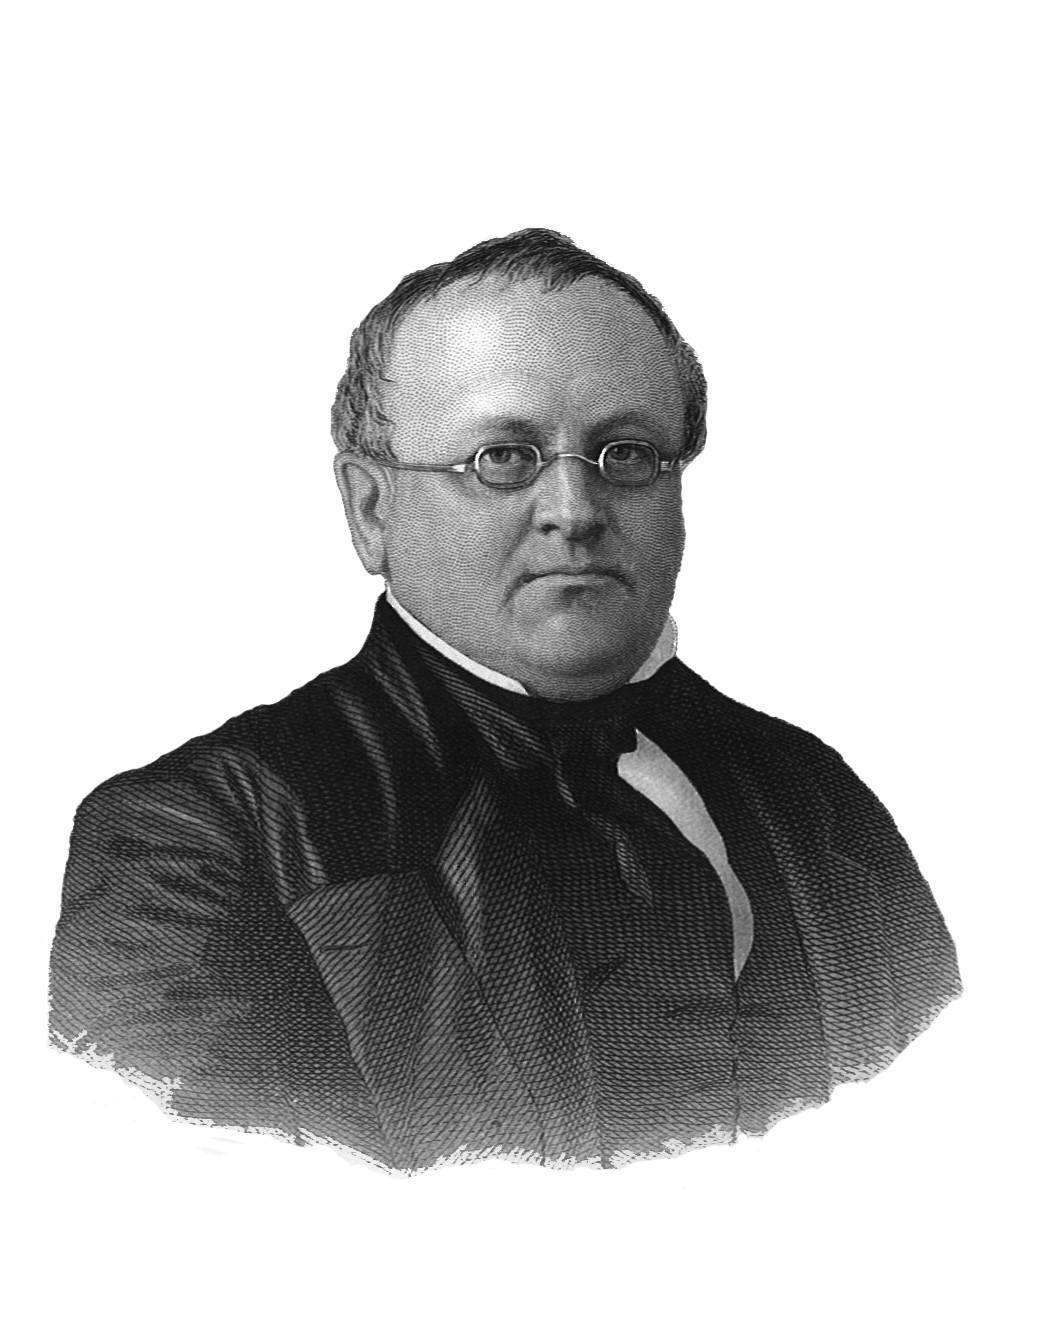 Alexander, Joseph Addison